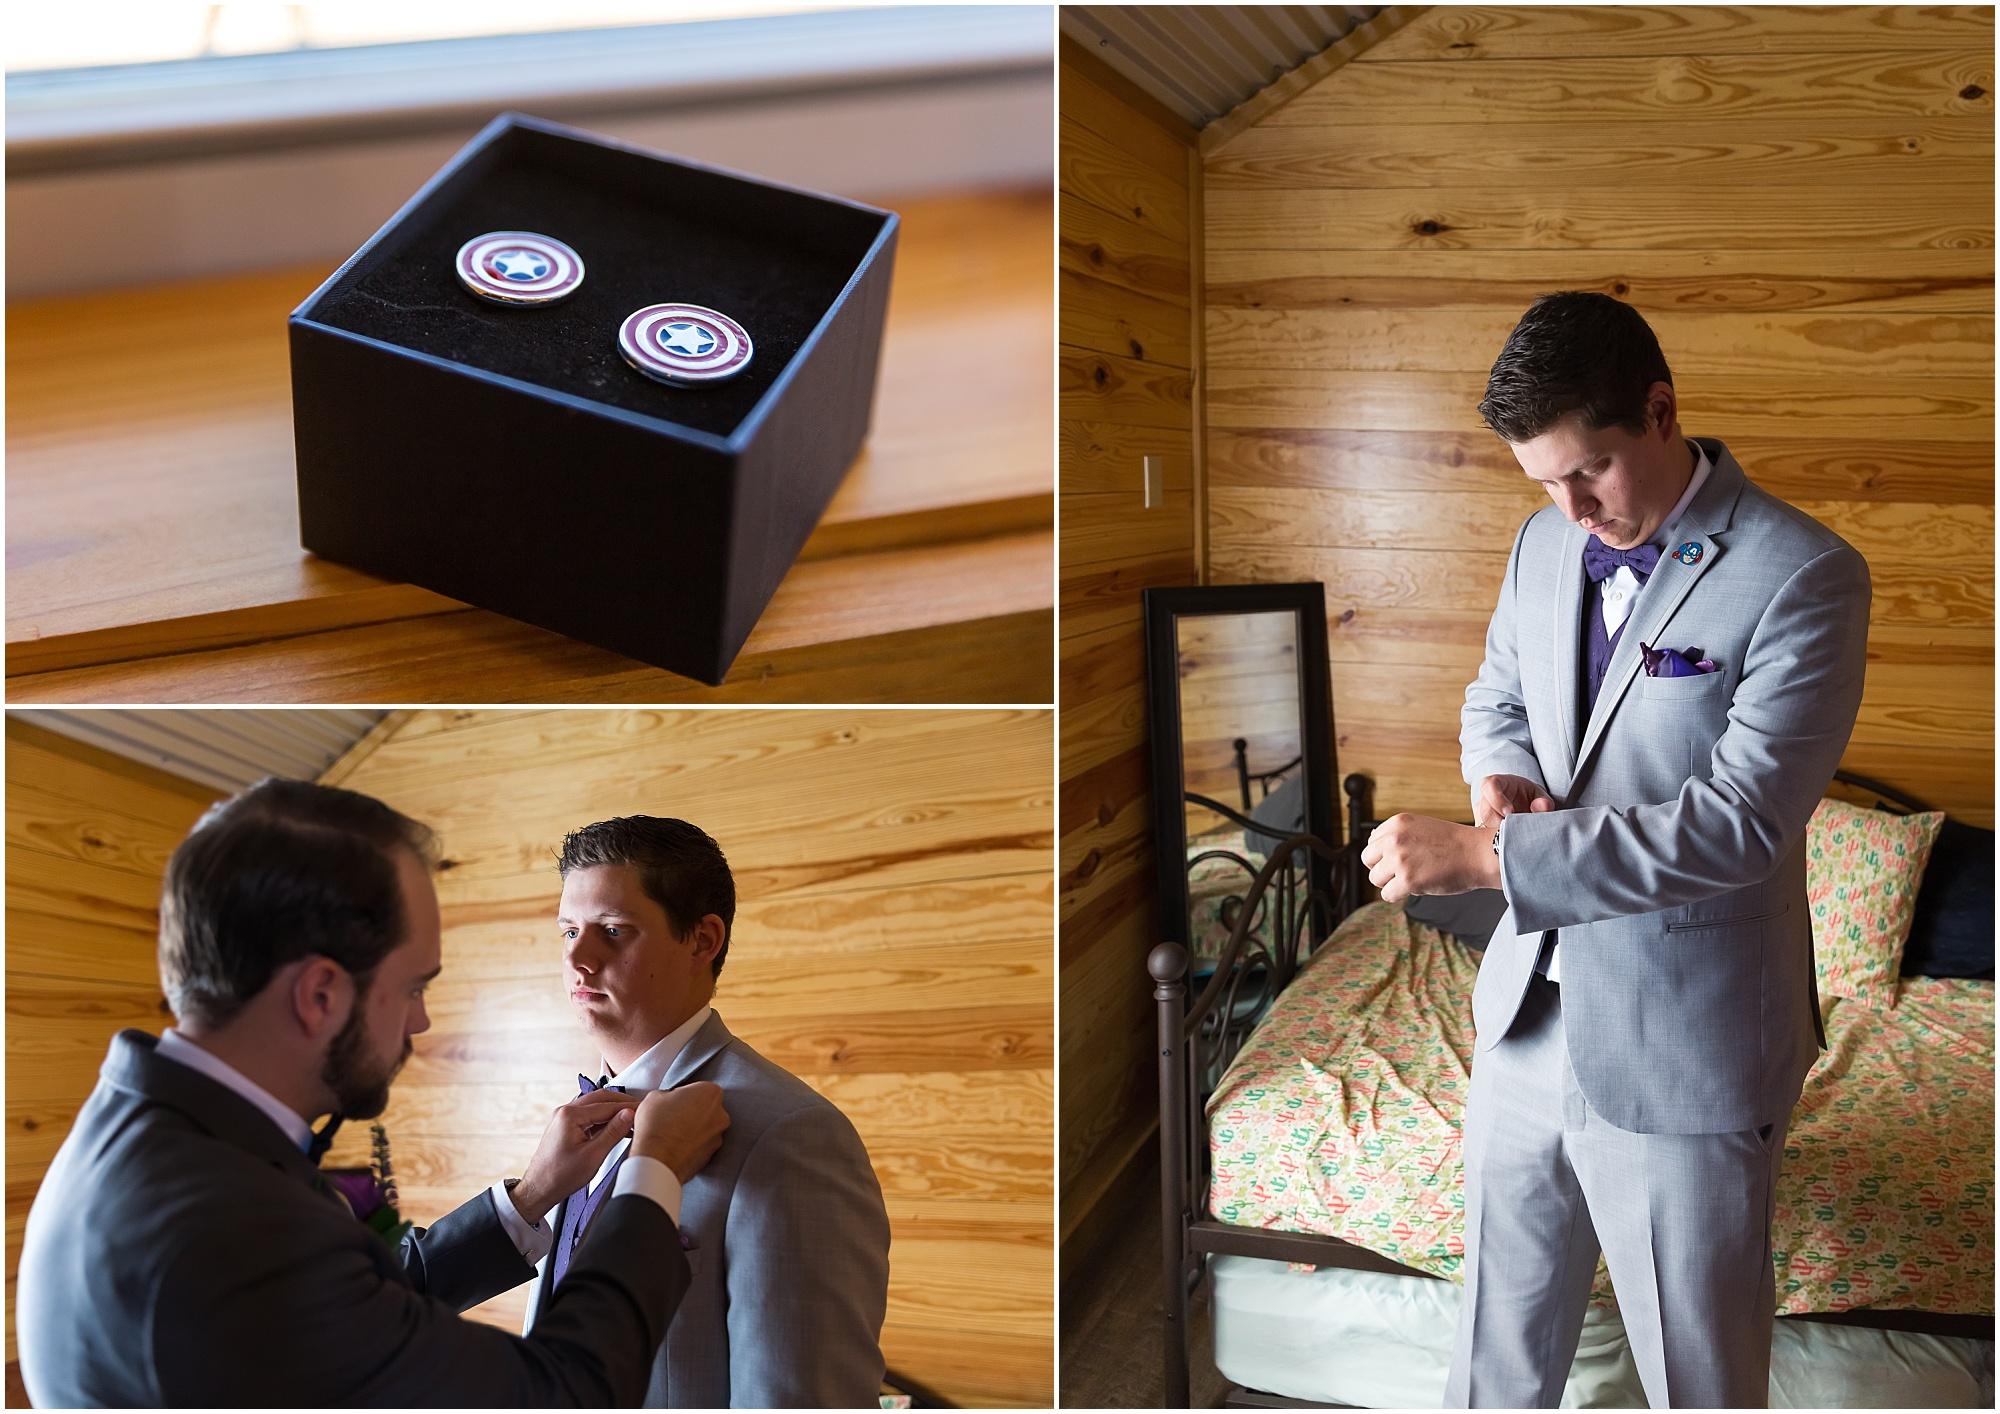 Disney-Inspired-Wedding-Central-Texas_0007.jpg